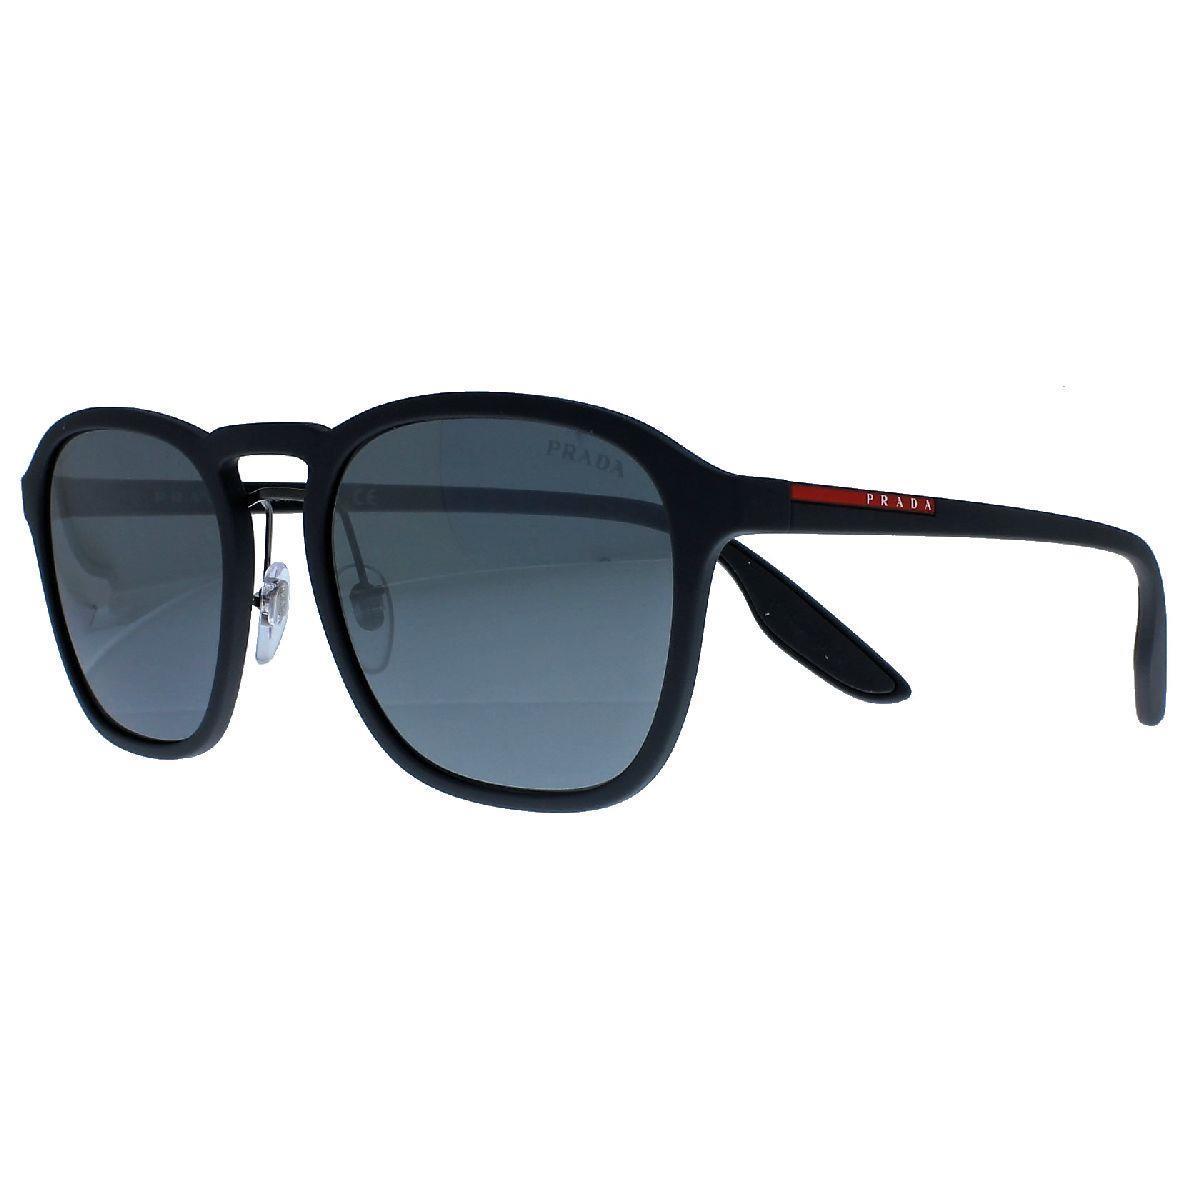 874d42323 Óculos de Sol Masculino Prada - PS02SS.TFZ7W155 - PS02SS.TFZ7W155 - PRADA  LINEA ROSSA